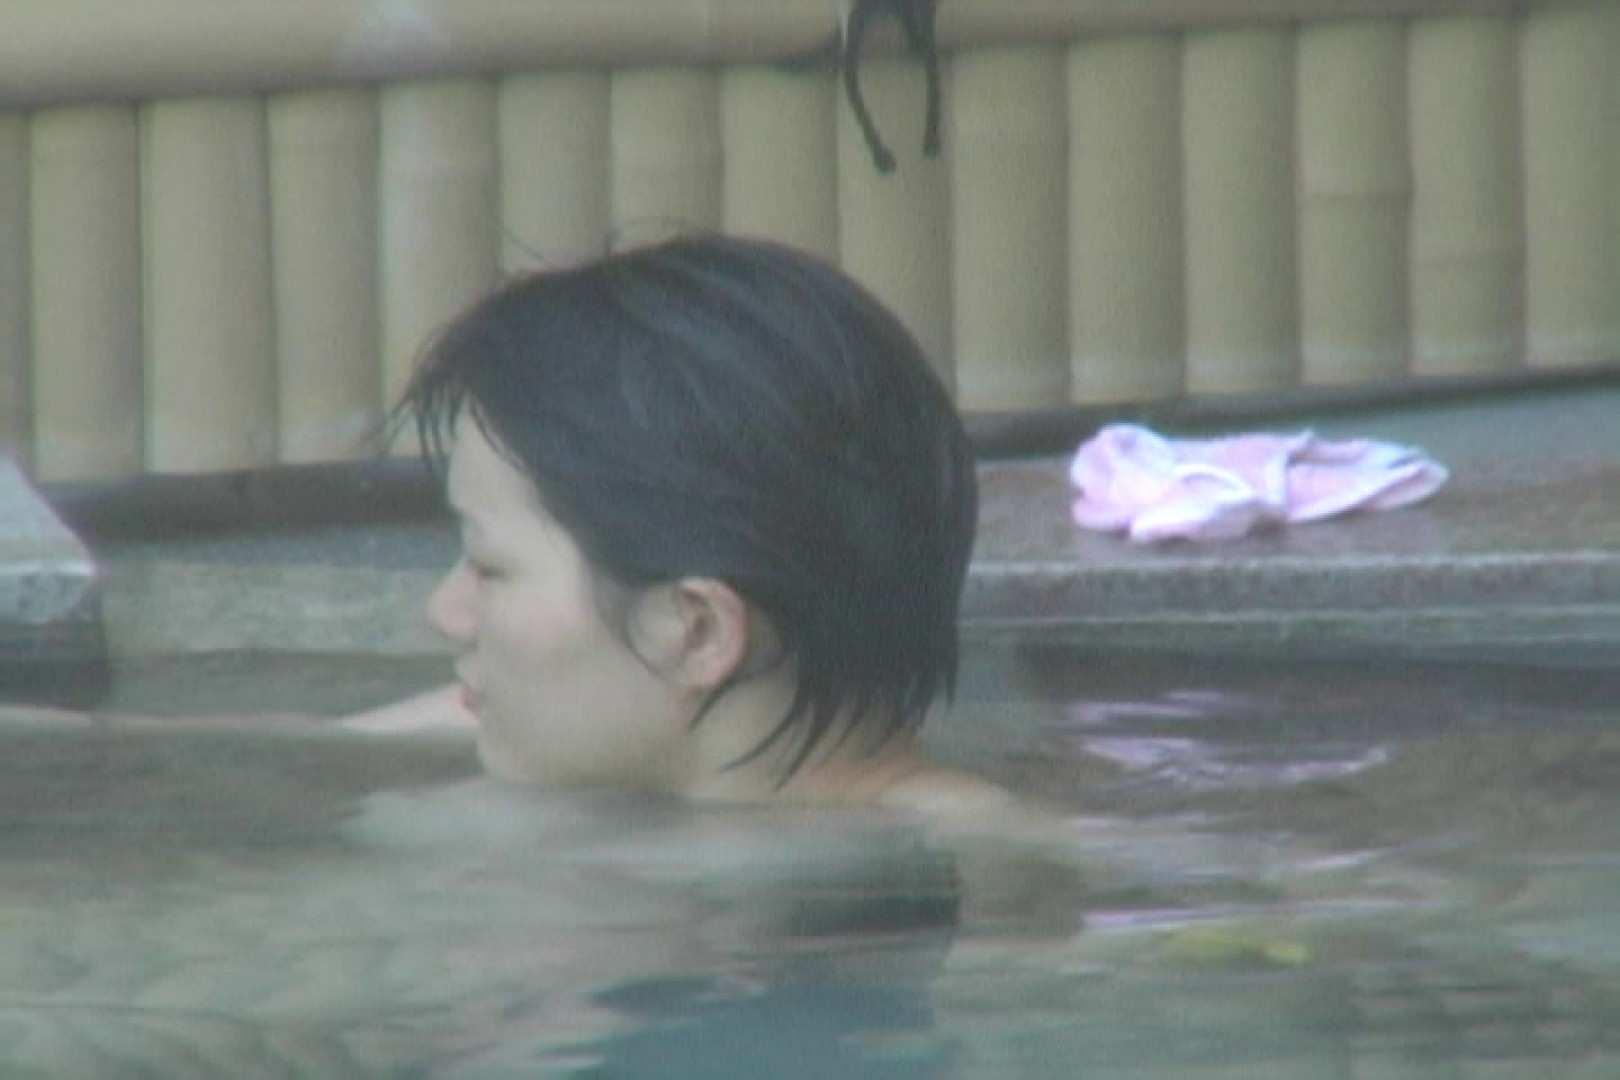 Aquaな露天風呂Vol.116 盗撮映像  42Pix 31